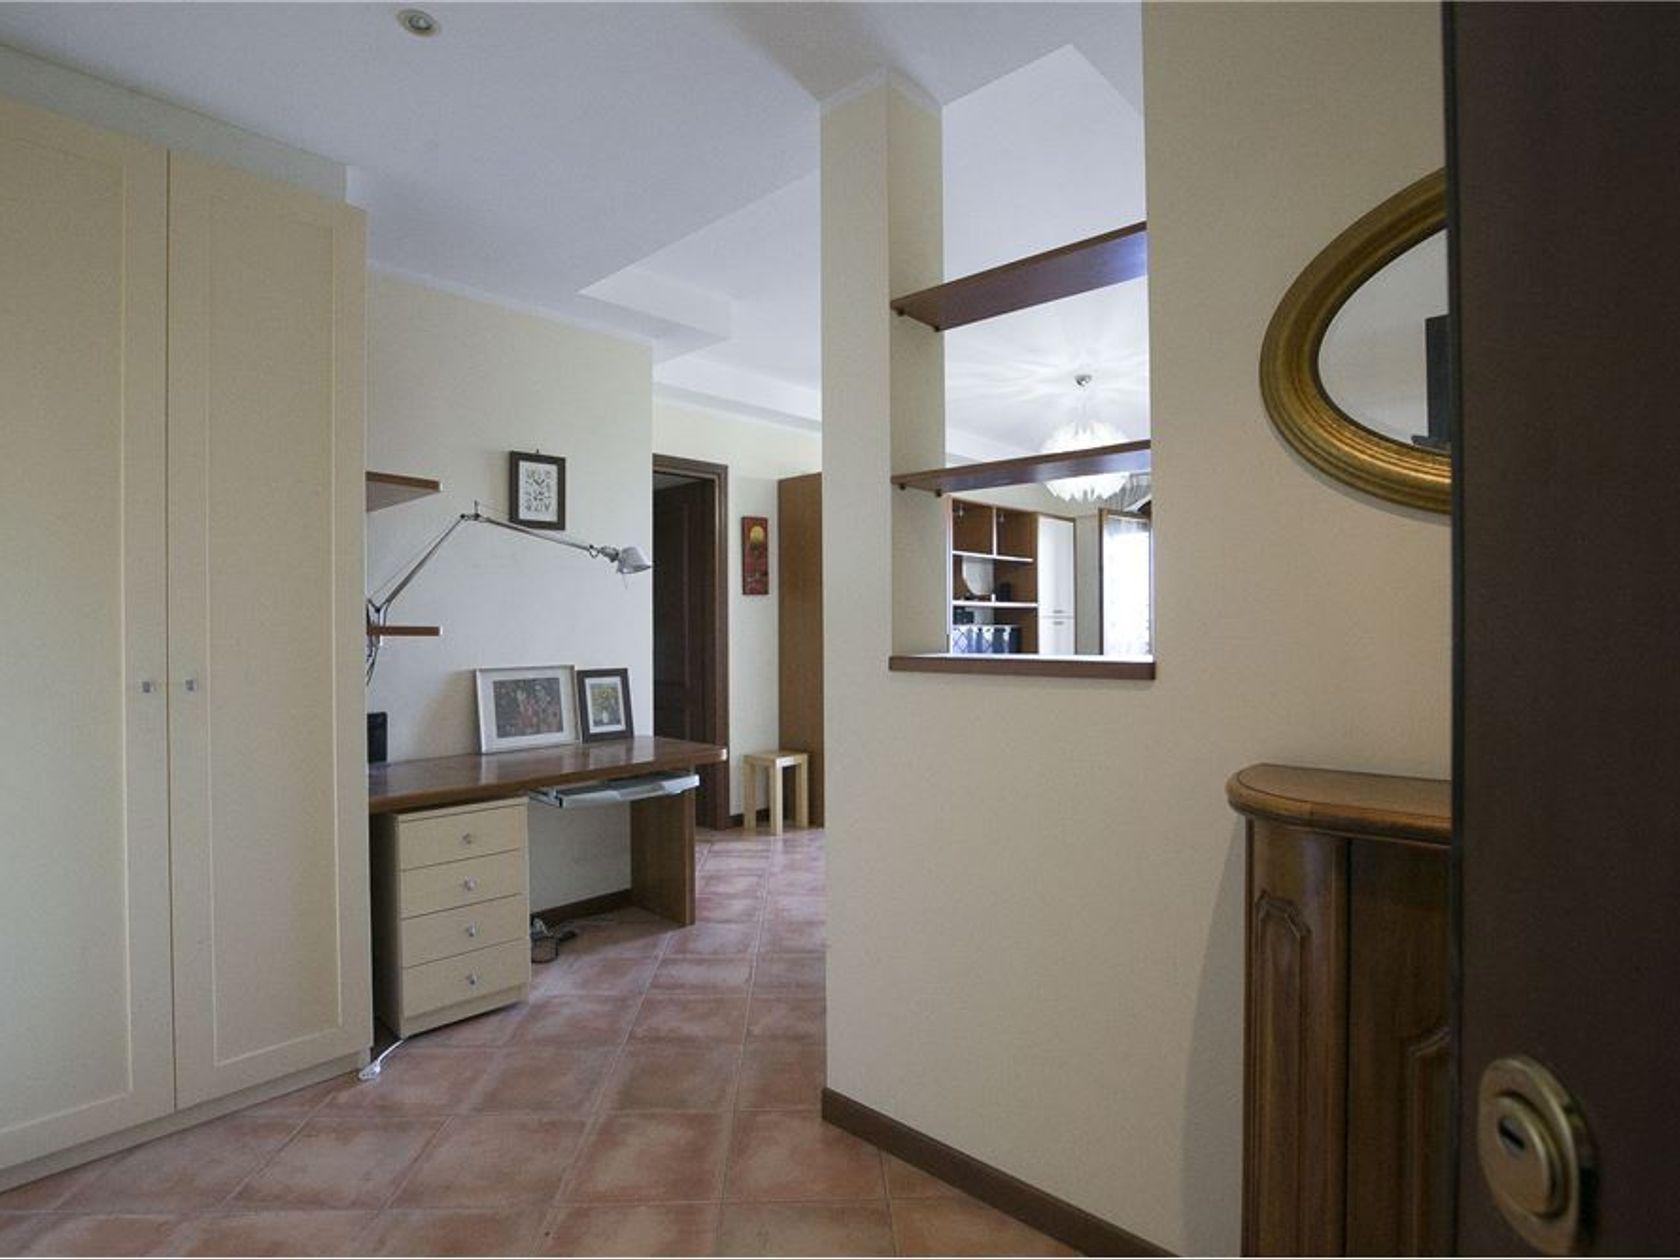 Appartamento Roma-acilia Vitinia Infernetto Axa Casal Palocco, Roma, RM Vendita - Foto 2